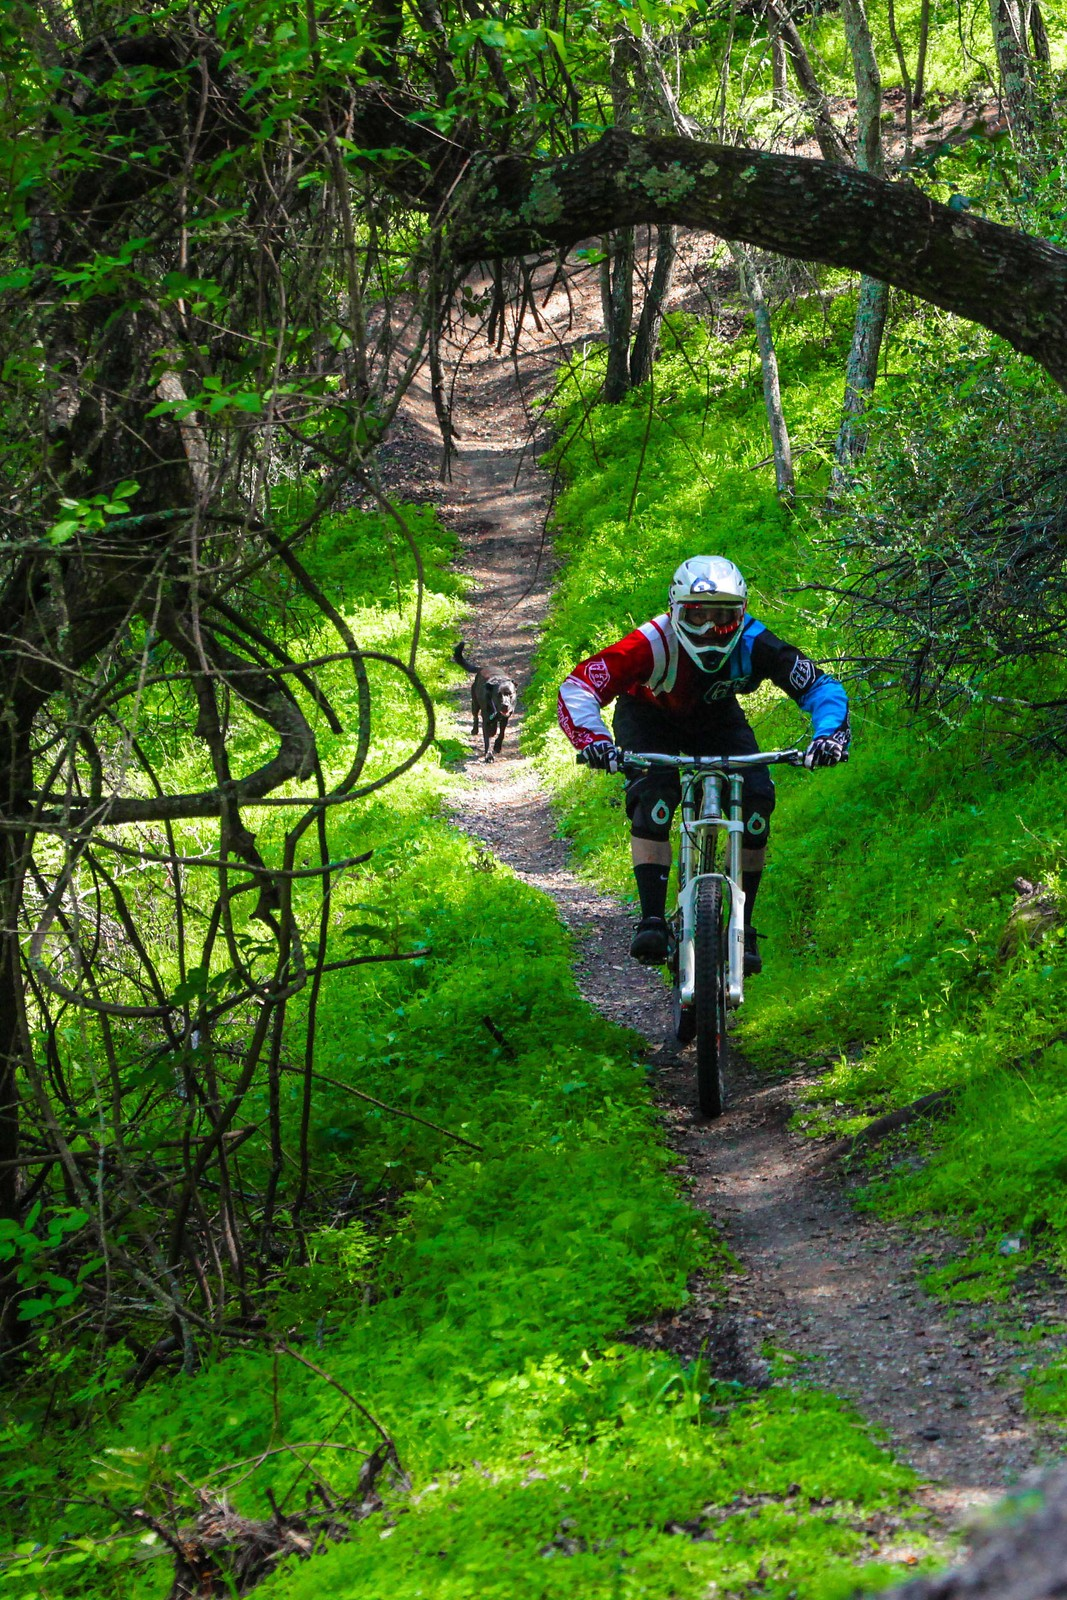 IMG 3057 - GnarHuck - Mountain Biking Pictures - Vital MTB